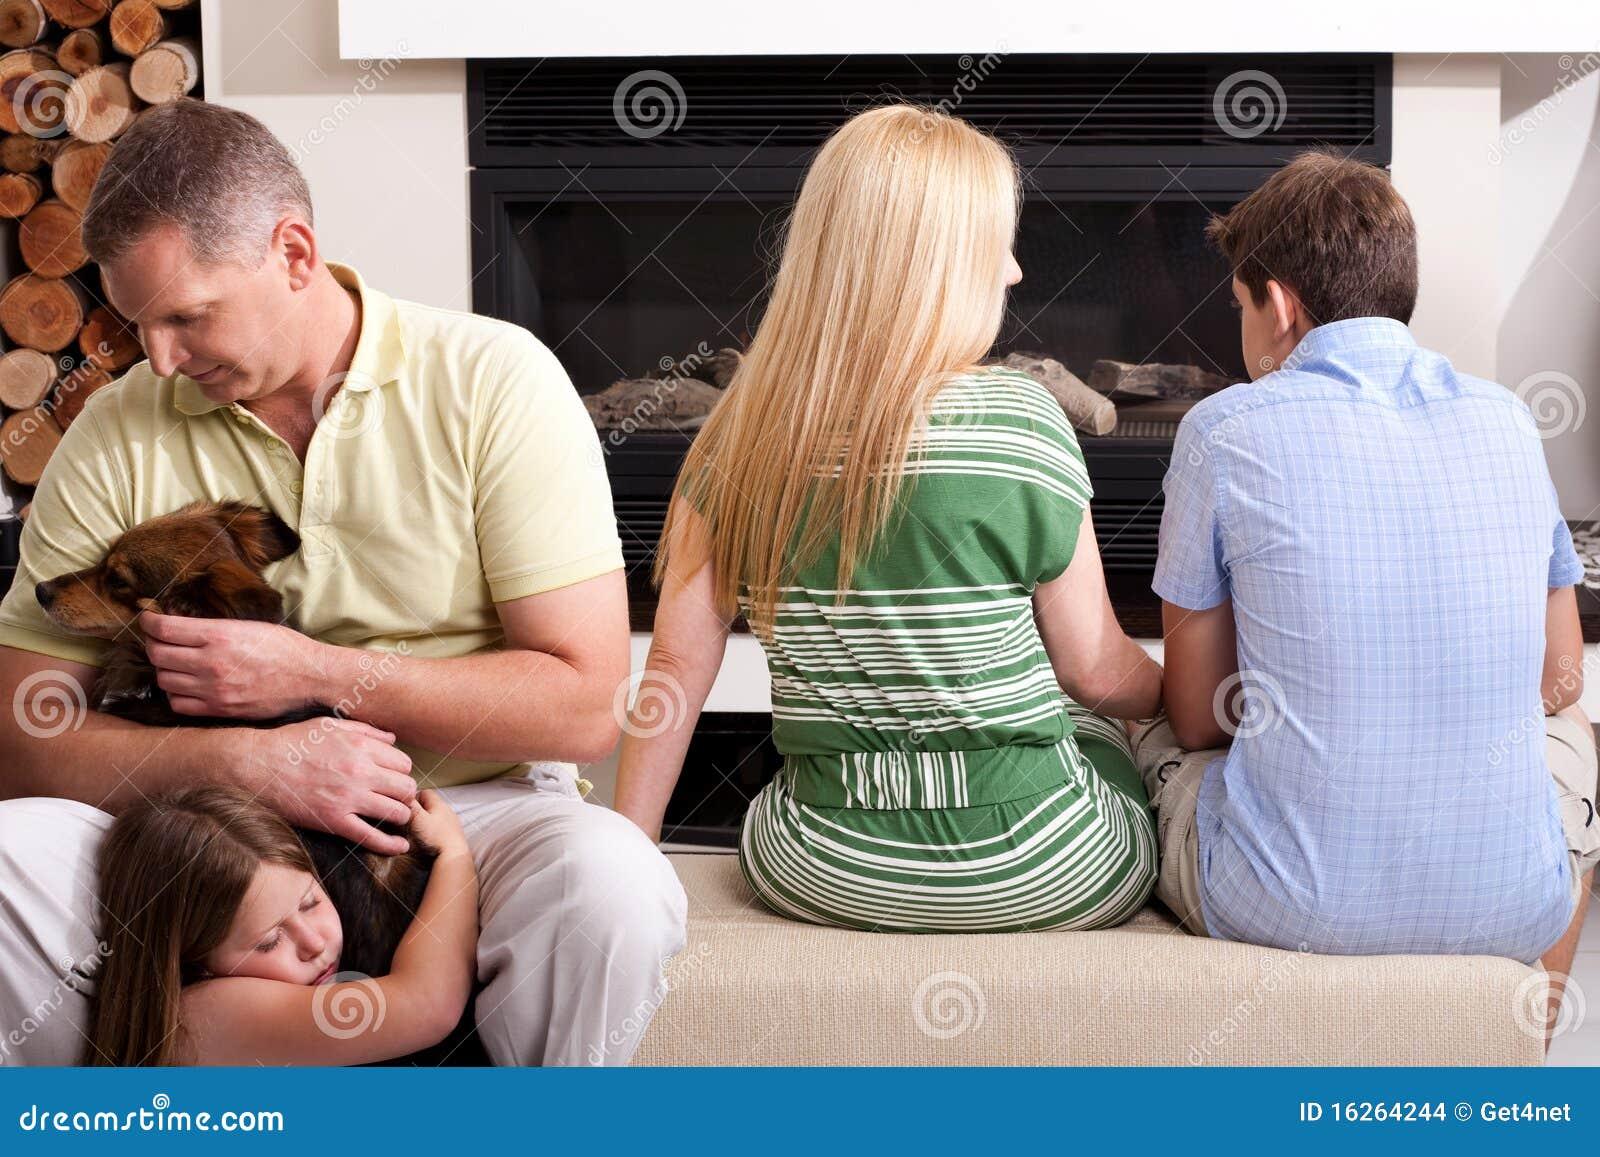 Family spending their lesiure time